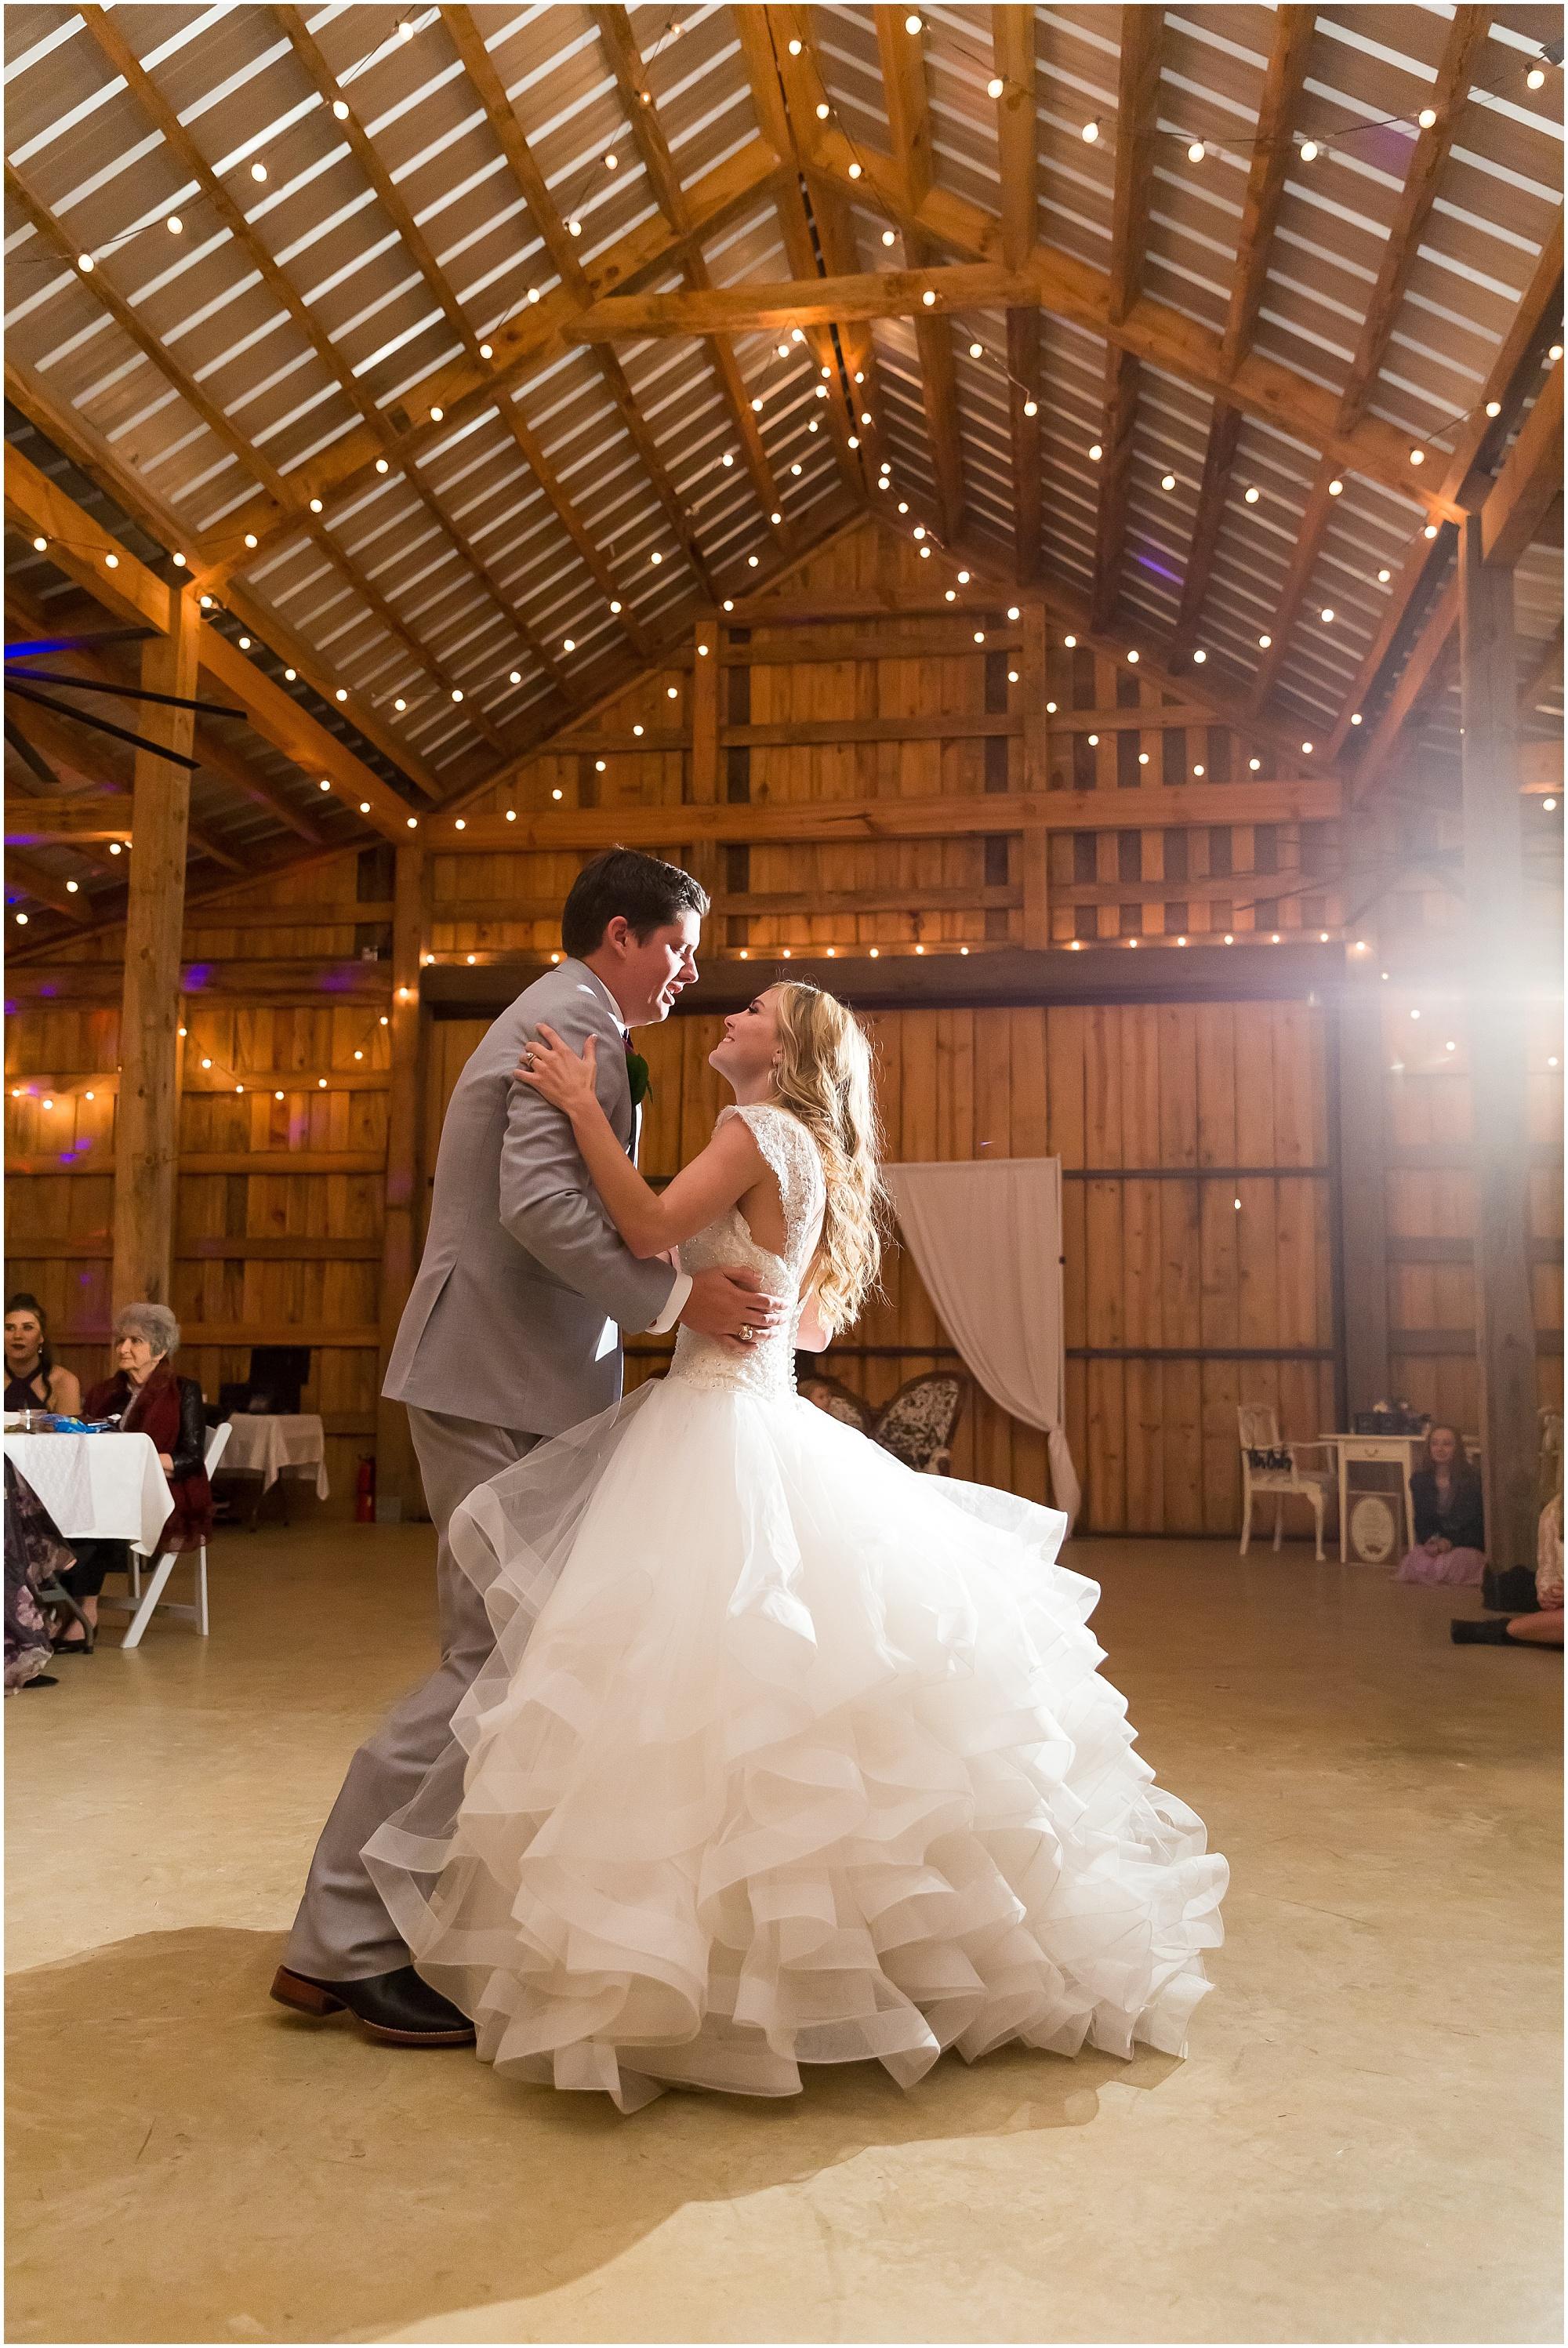 Disney-Inspired-Wedding-Central-Texas_0056.jpg